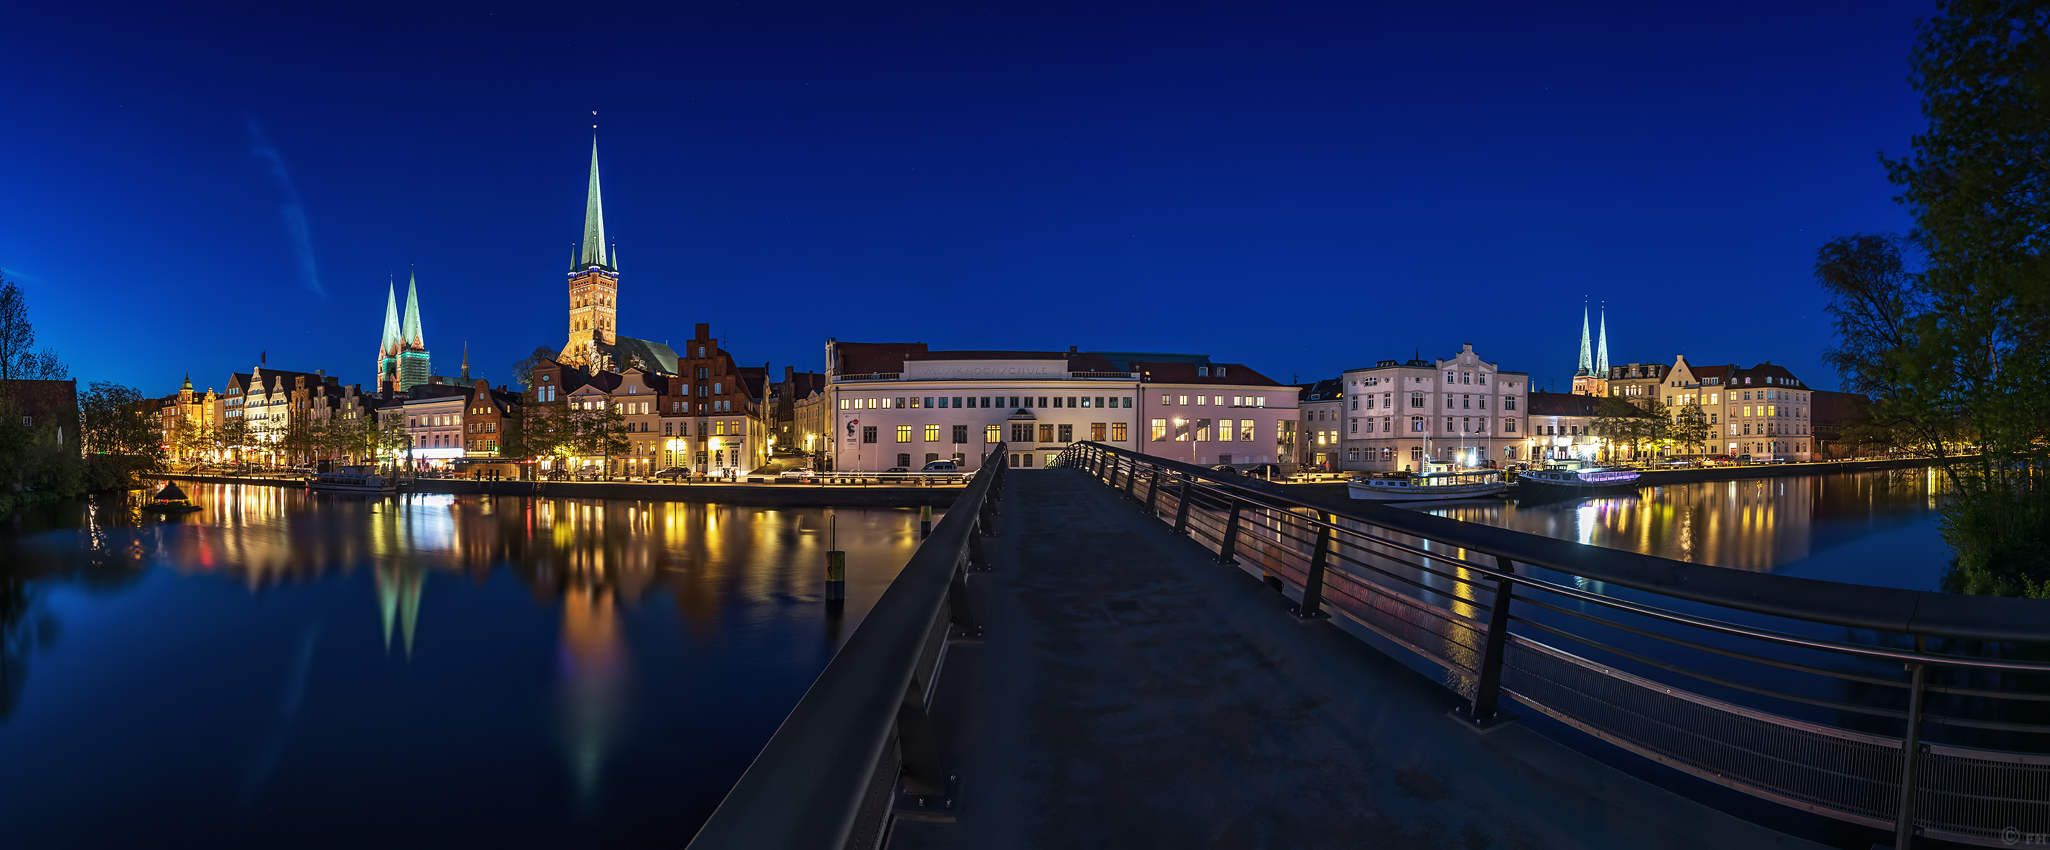 Luebeck_Skyline_Panorama_1_k